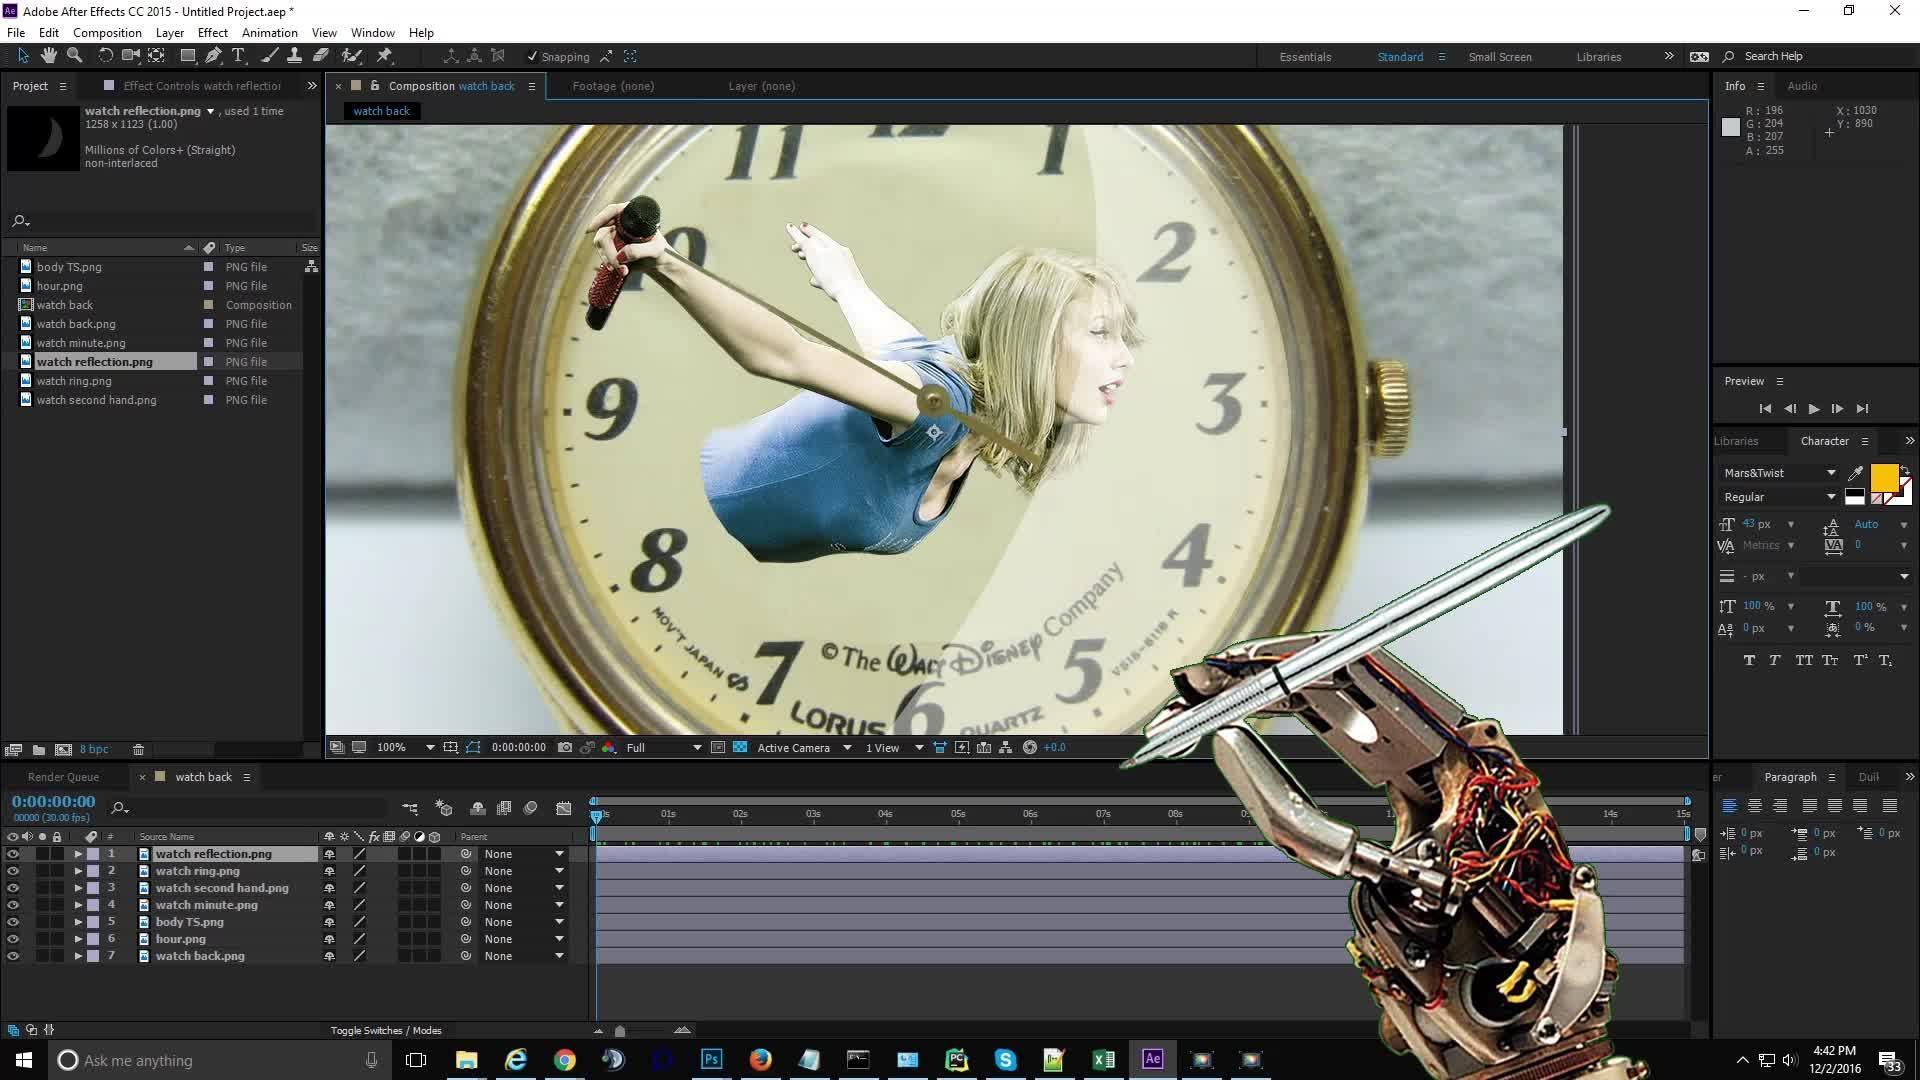 CreationGifs, photoshopbattles, PsBattle: Taylor Swift in a weird pose (reddit) GIFs